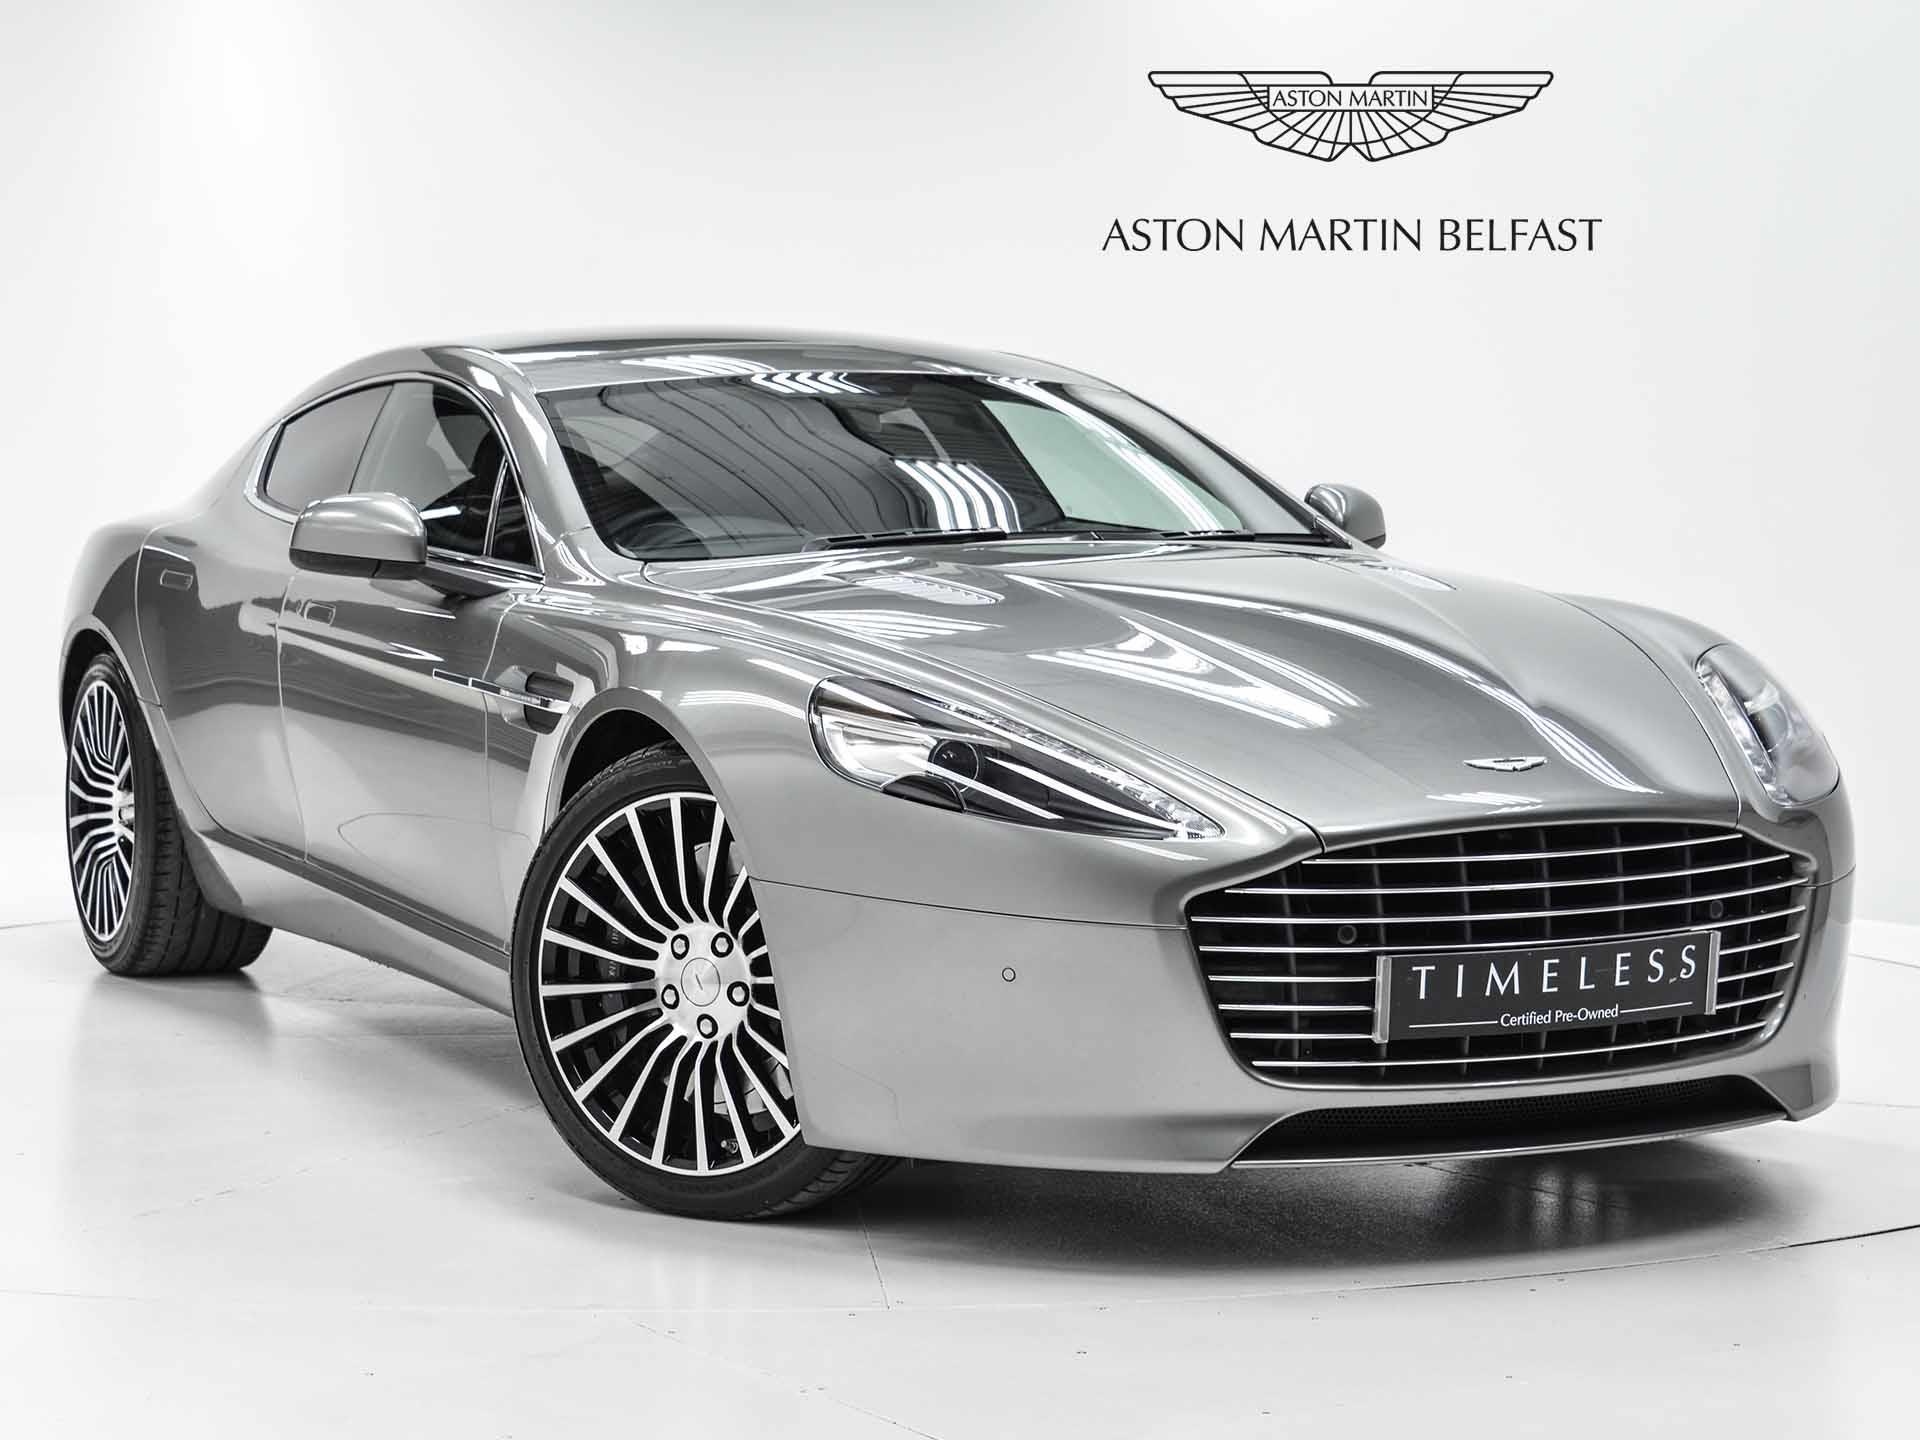 pre-owned   aston martin belfast - official aston martin dealer